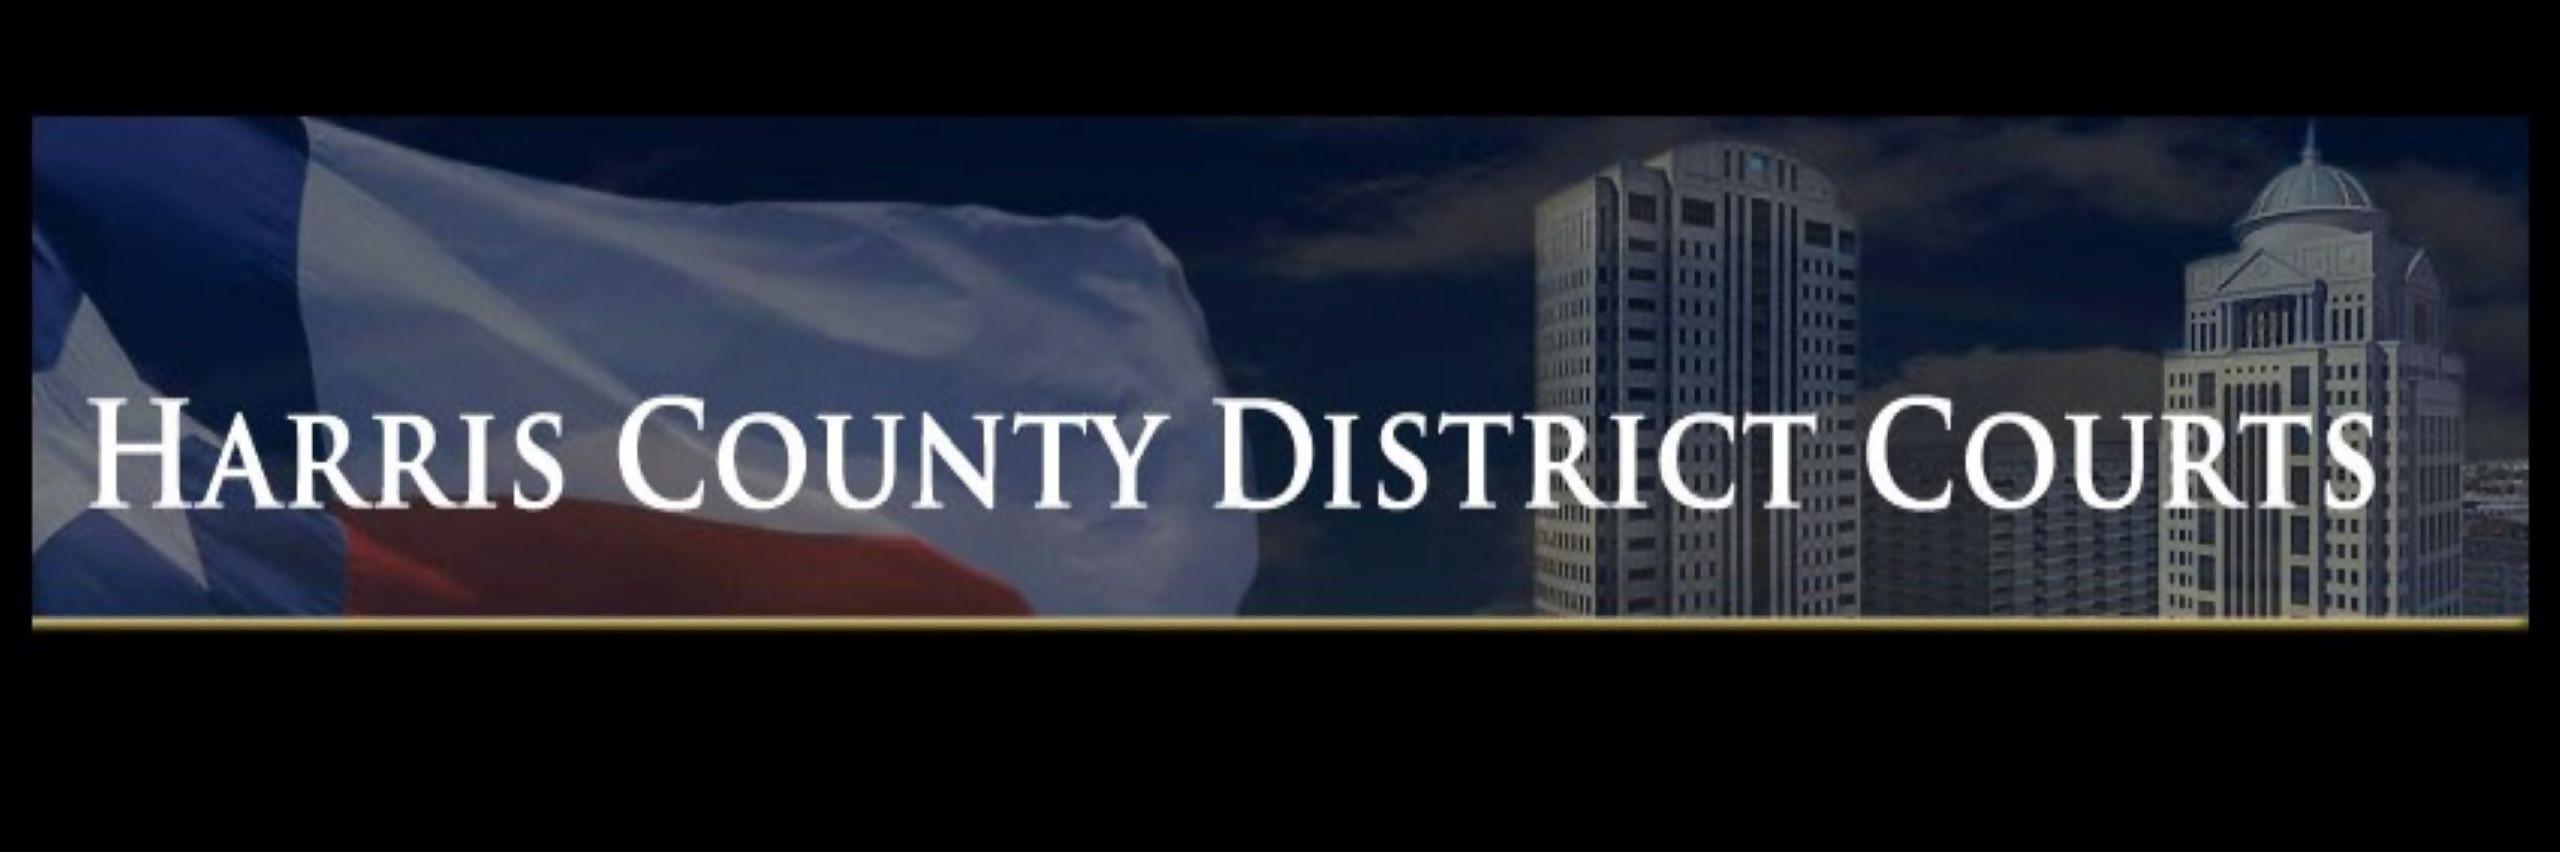 189th District Court - Live Stream